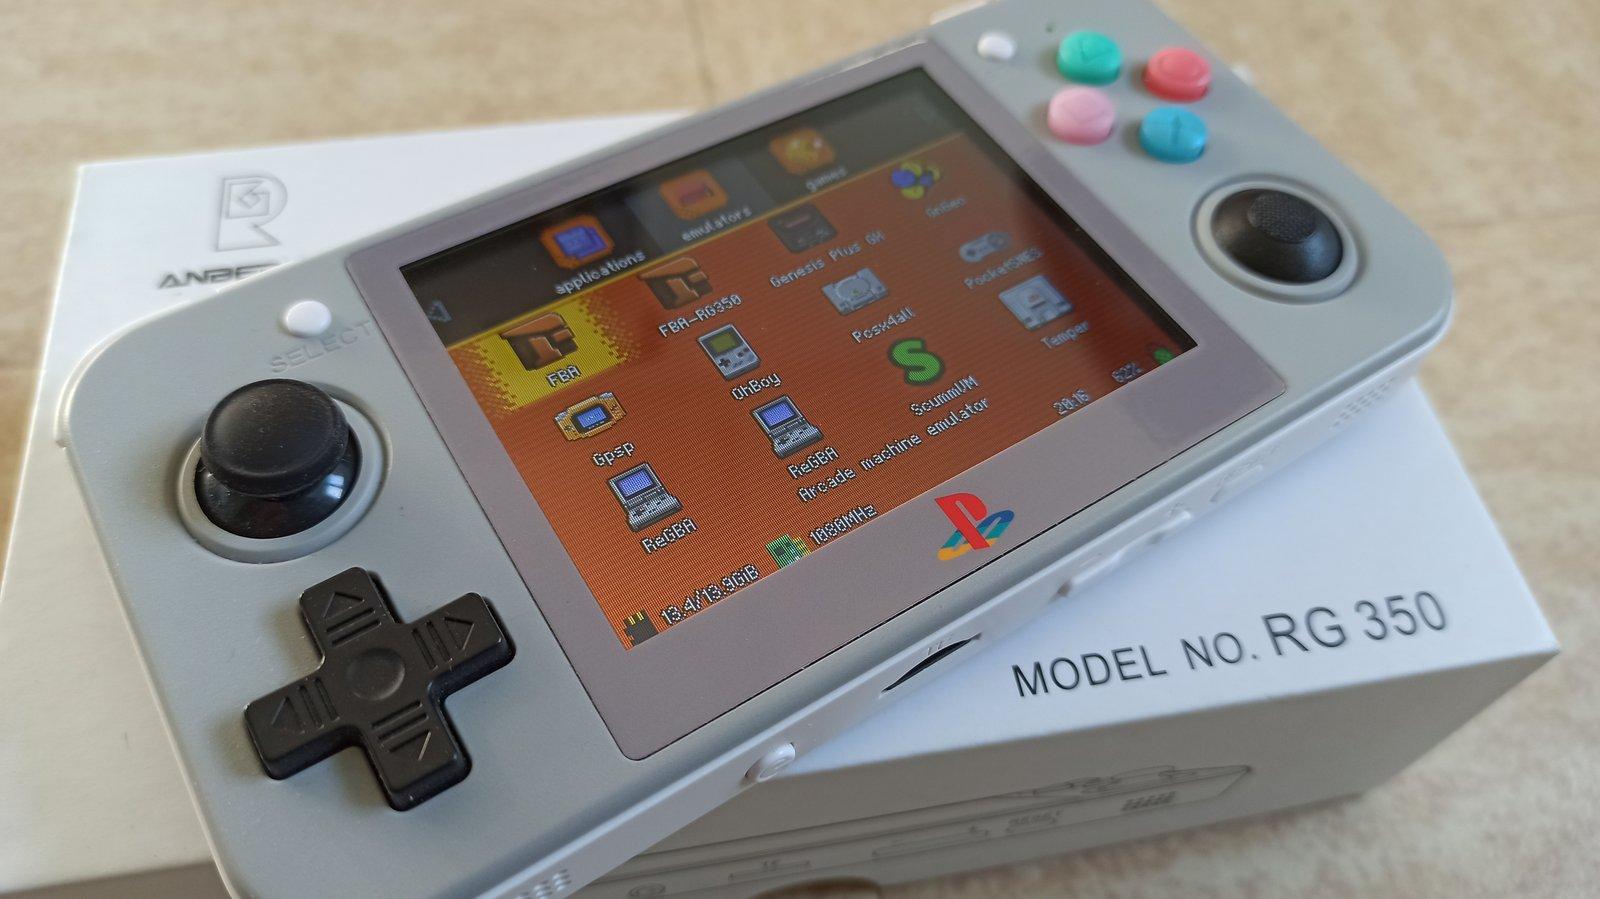 RG350 mod Sakura / Retroid Pocket 2  210110052329979747